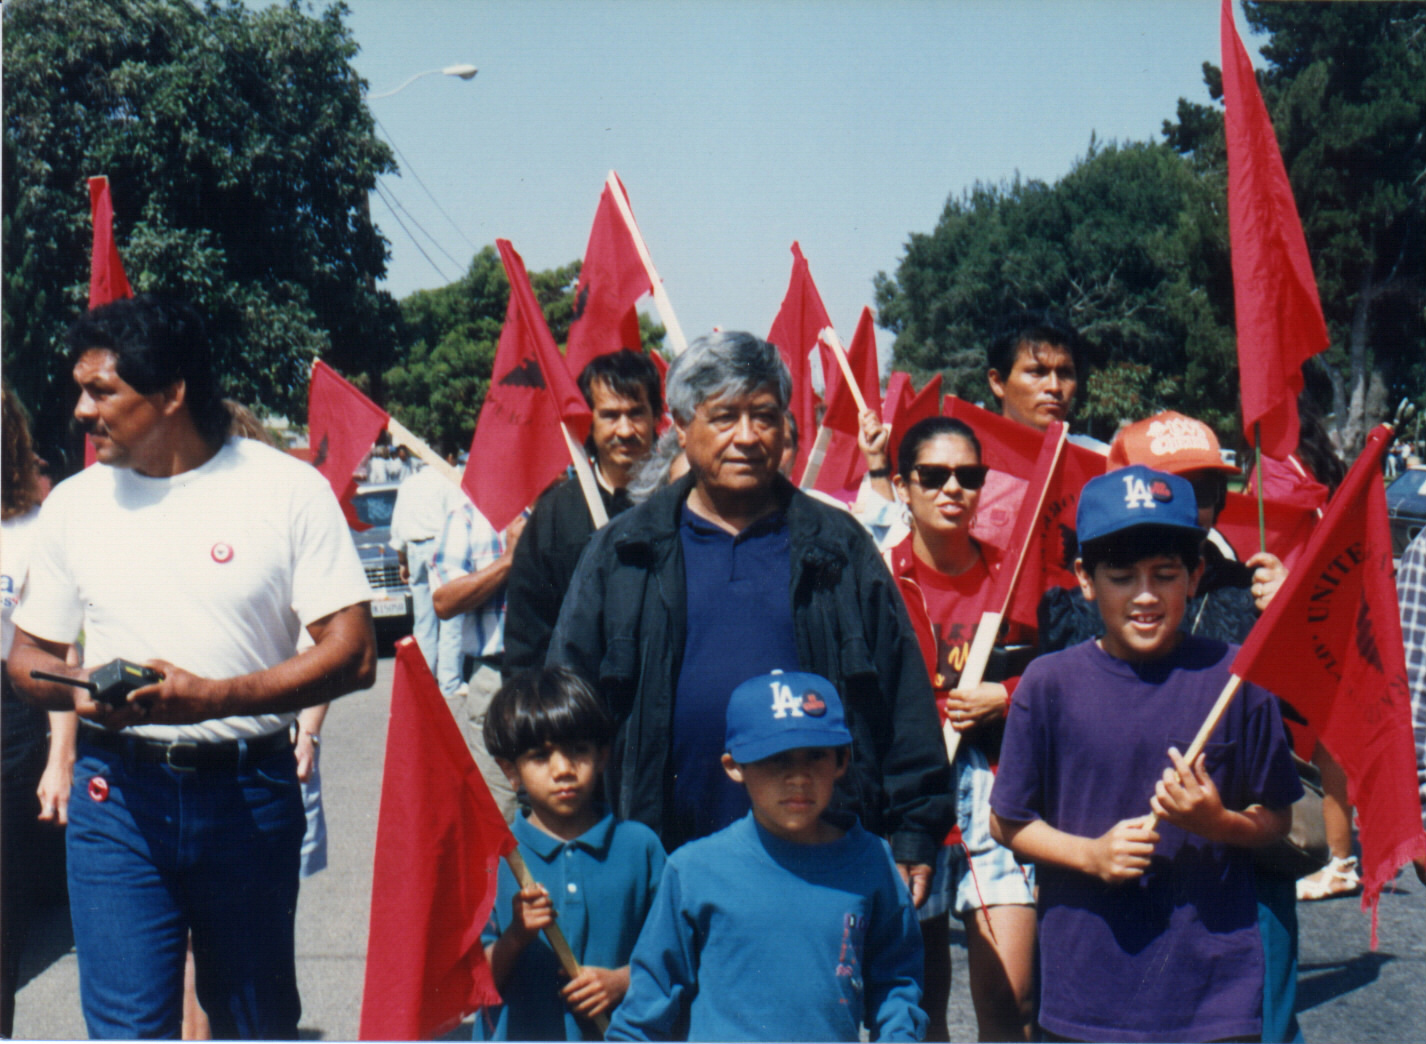 Cesar Chavez, Anthony Chavez, march,